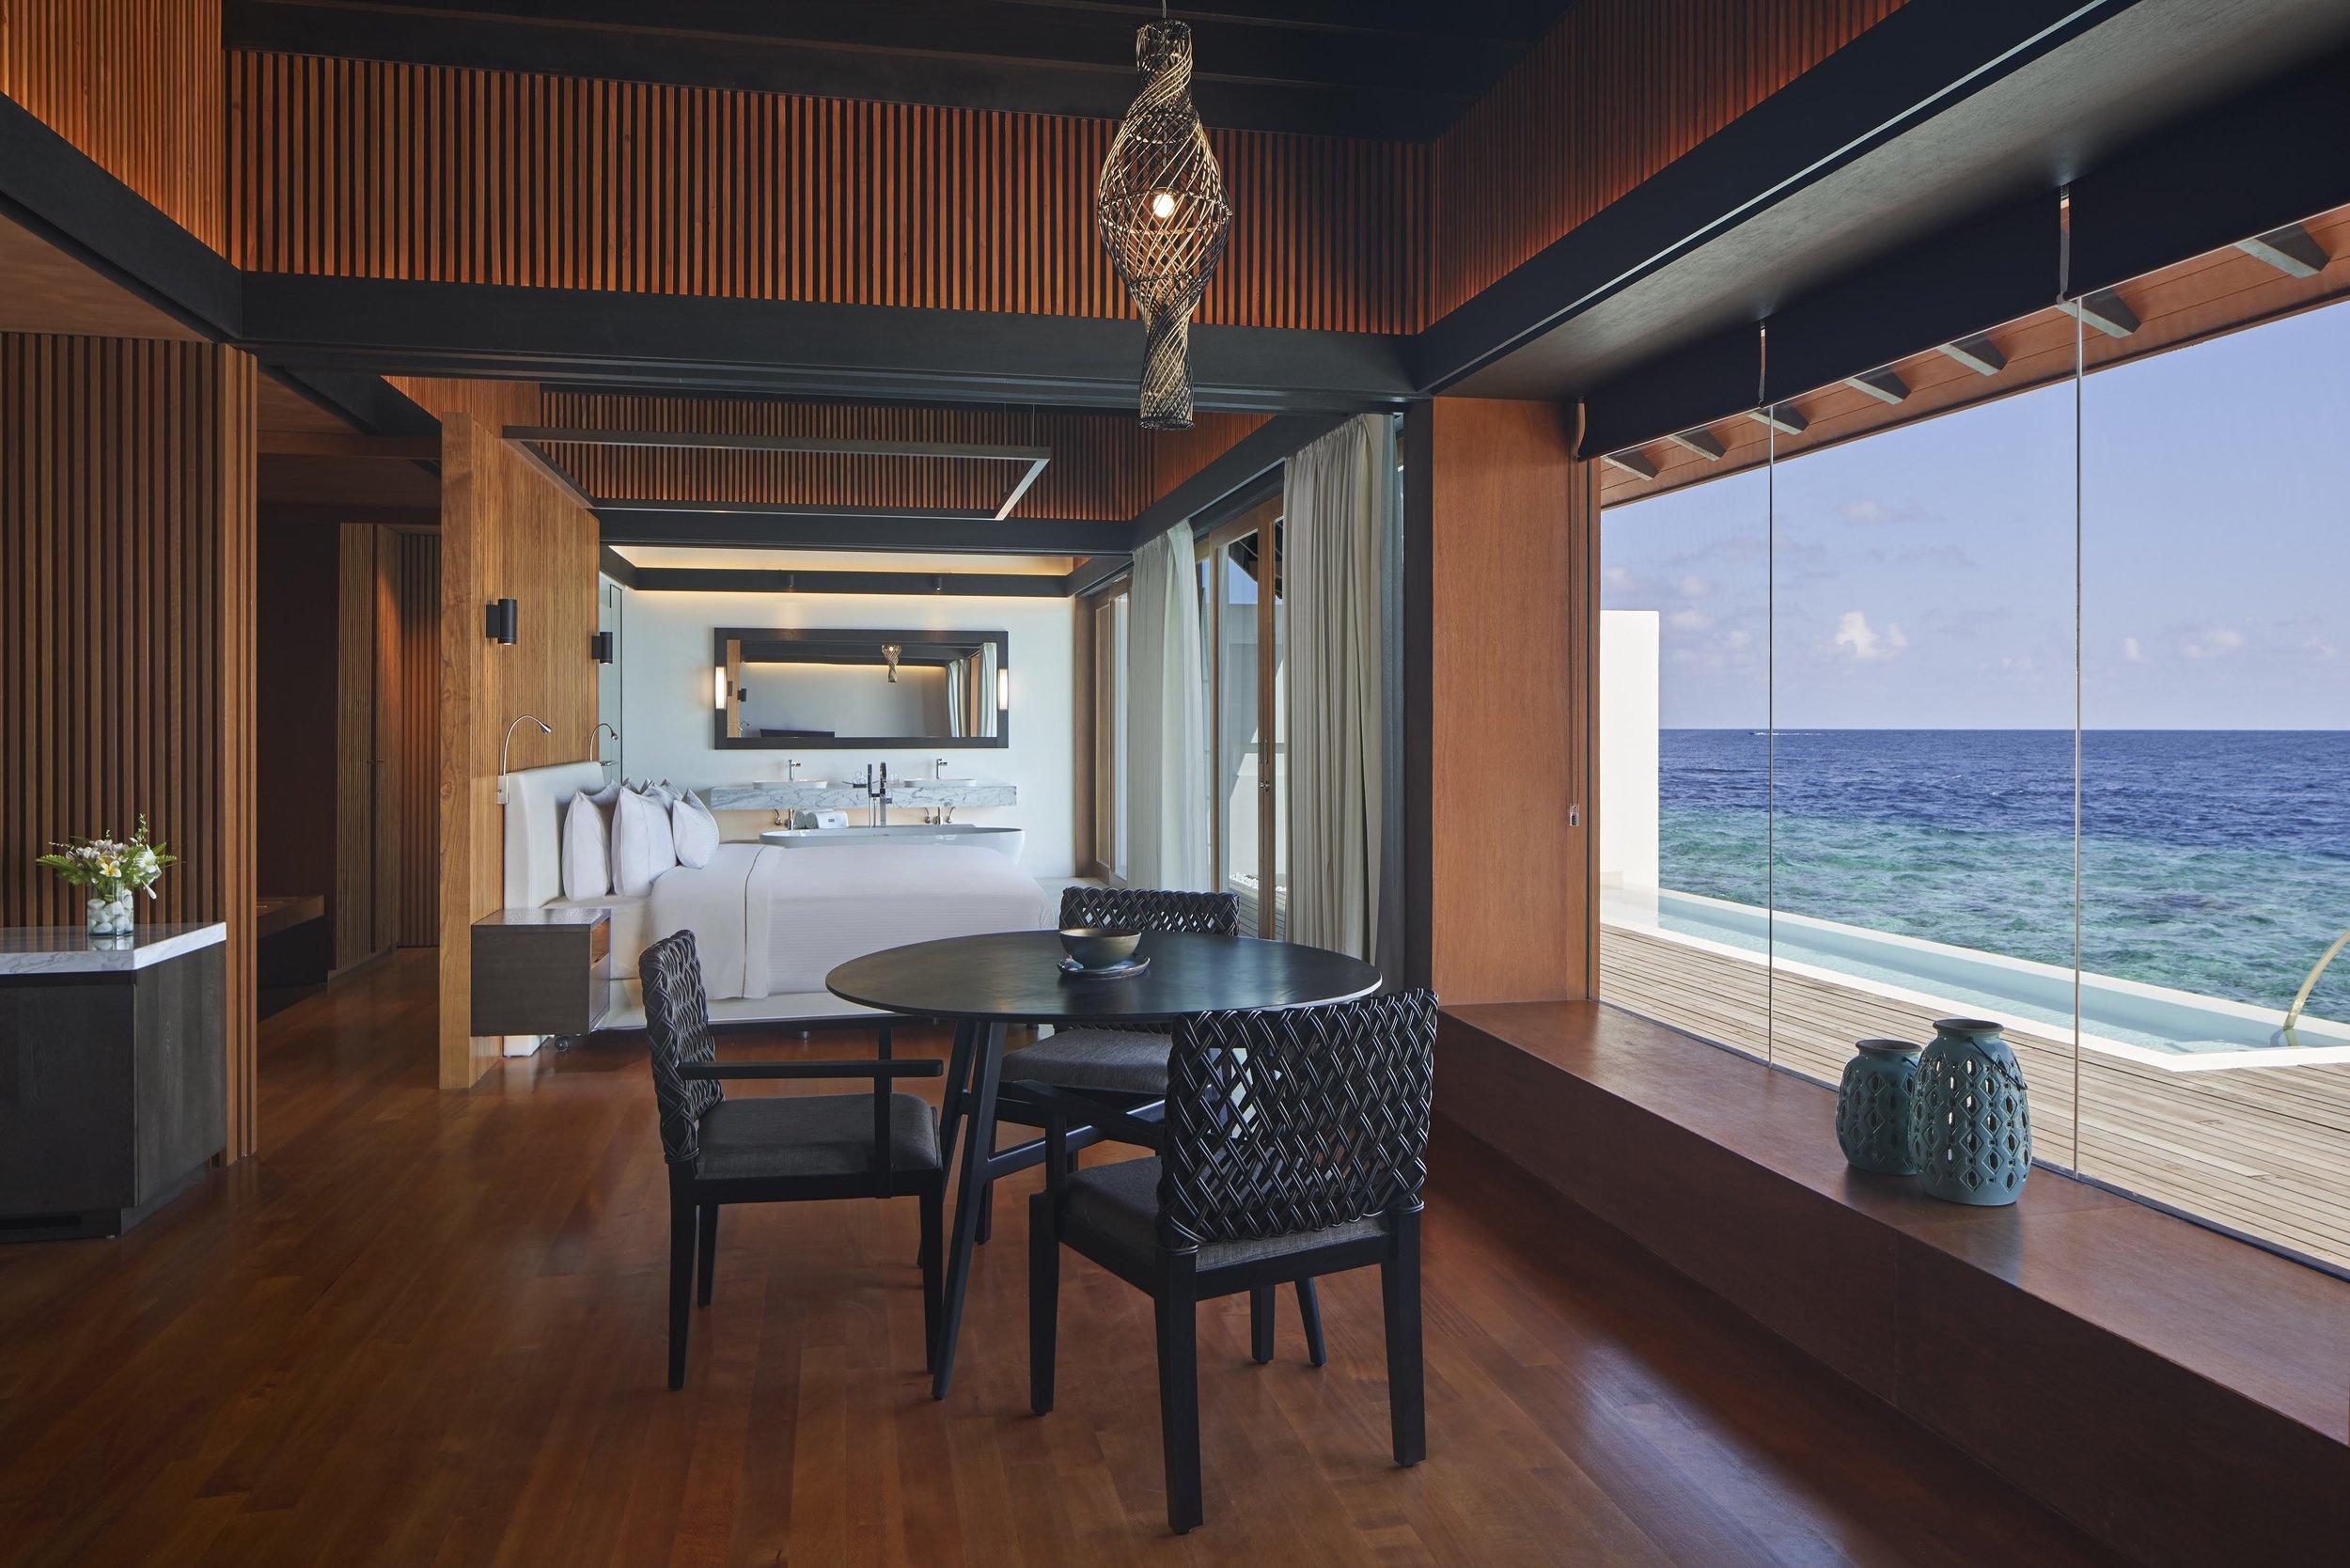 The_Westin_Maldives_Overwater_Suite_Pool_Interior[1].jpg